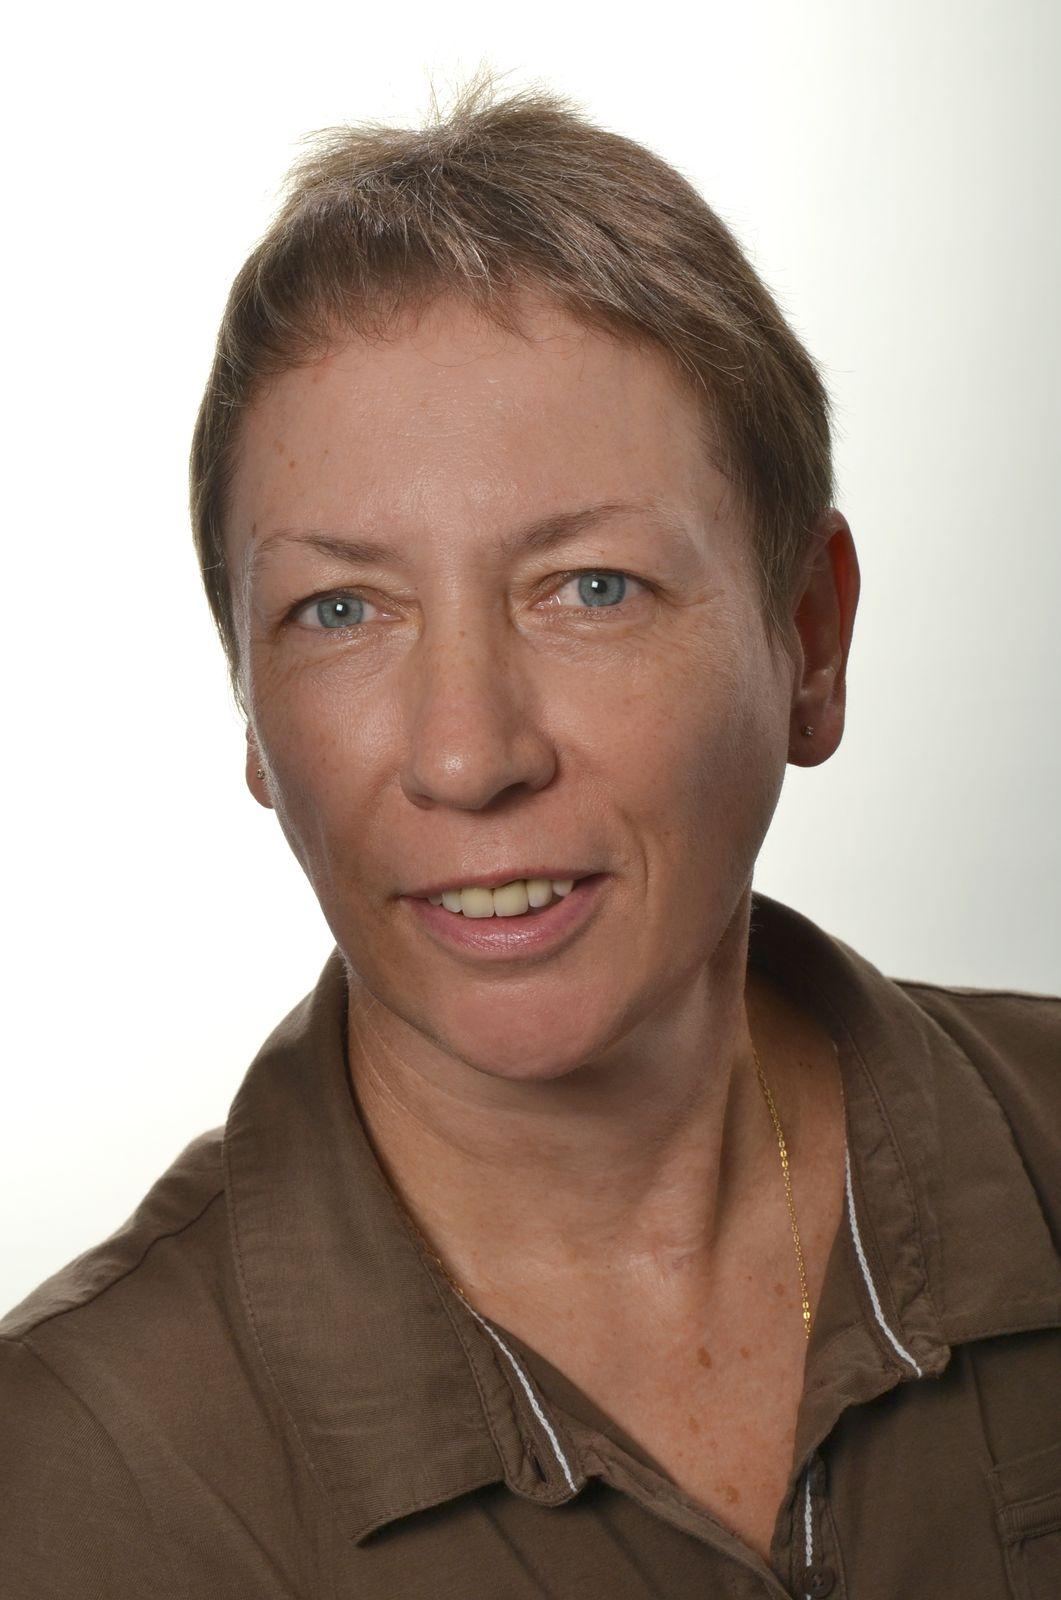 Schriftführerin Angelika Korscheia - Fink